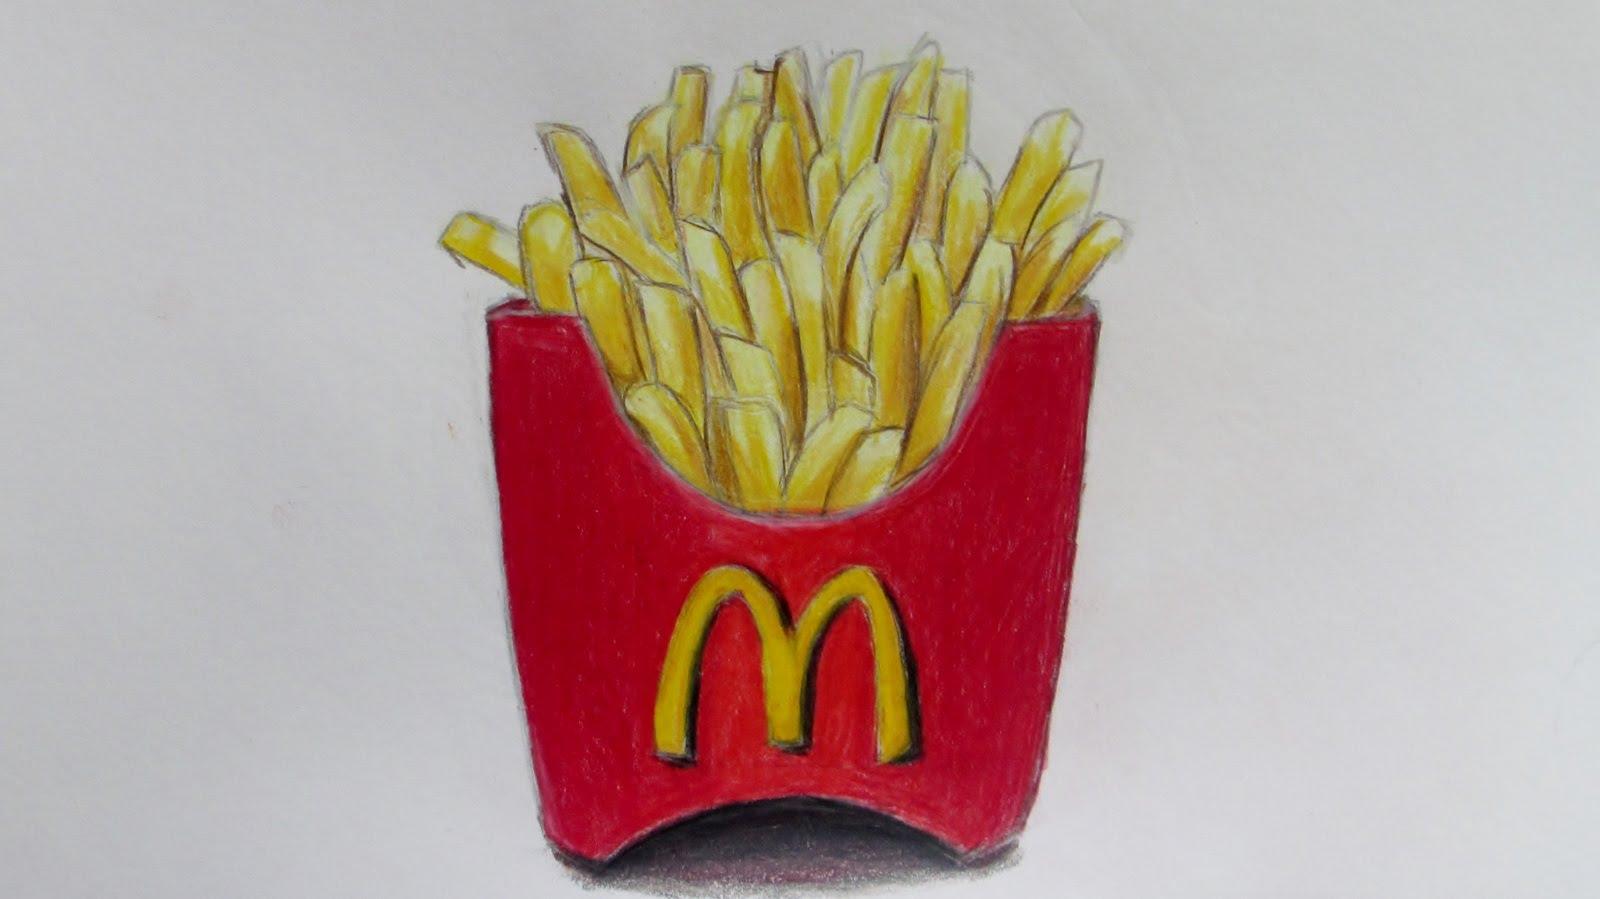 Chips clipart fry mcdonalds. Realistic mcdonald s fries